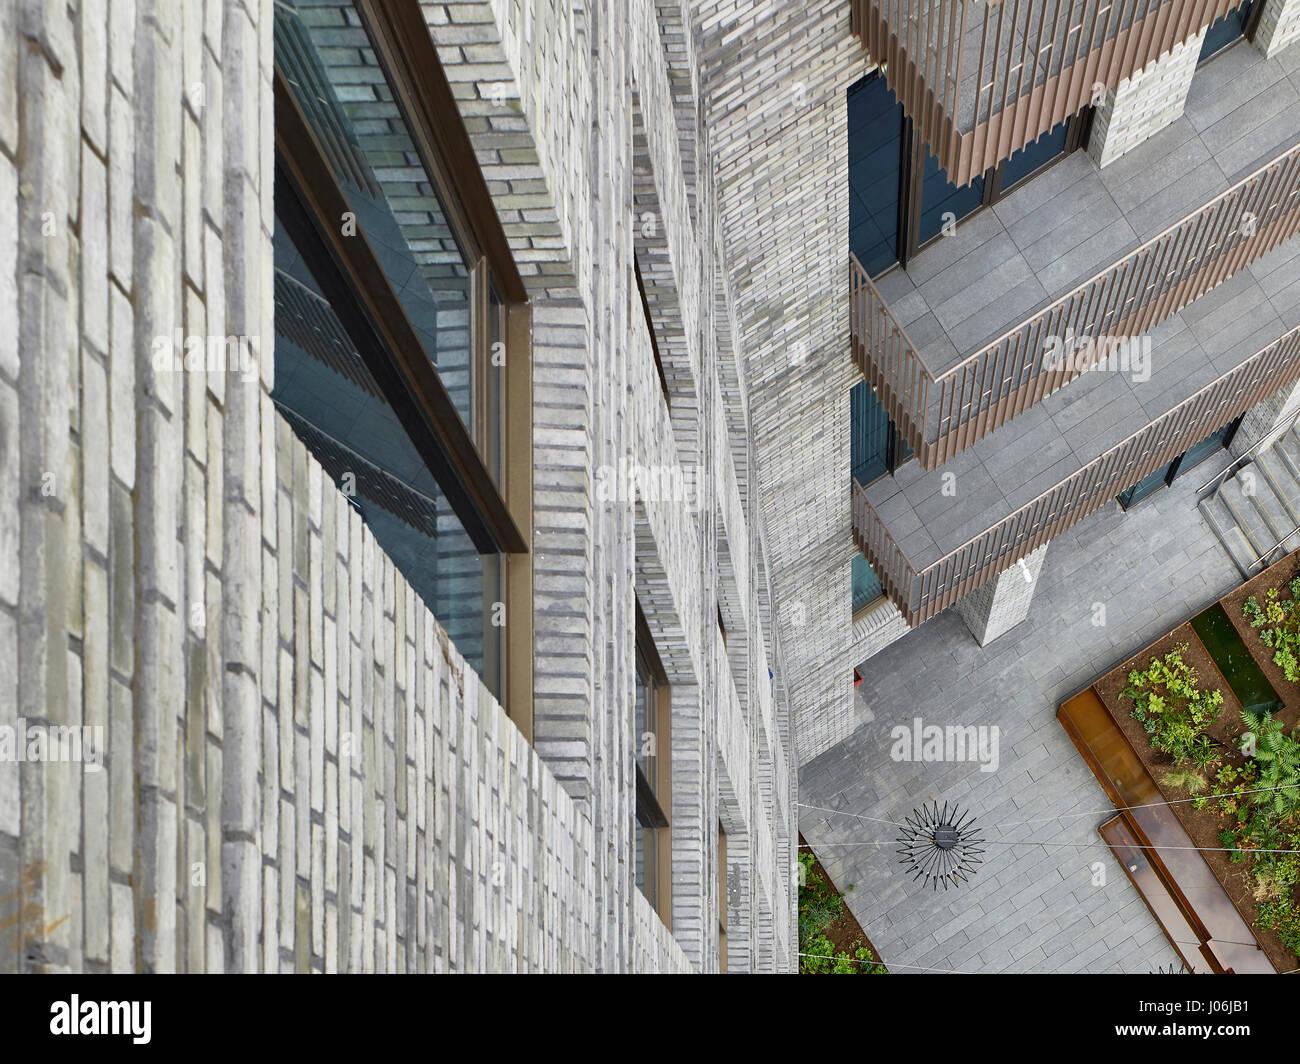 Balconies. 55 Victoria Street, London, United Kingdom. Architect: Stiff + Trevillion Architects, 2016. - Stock Image